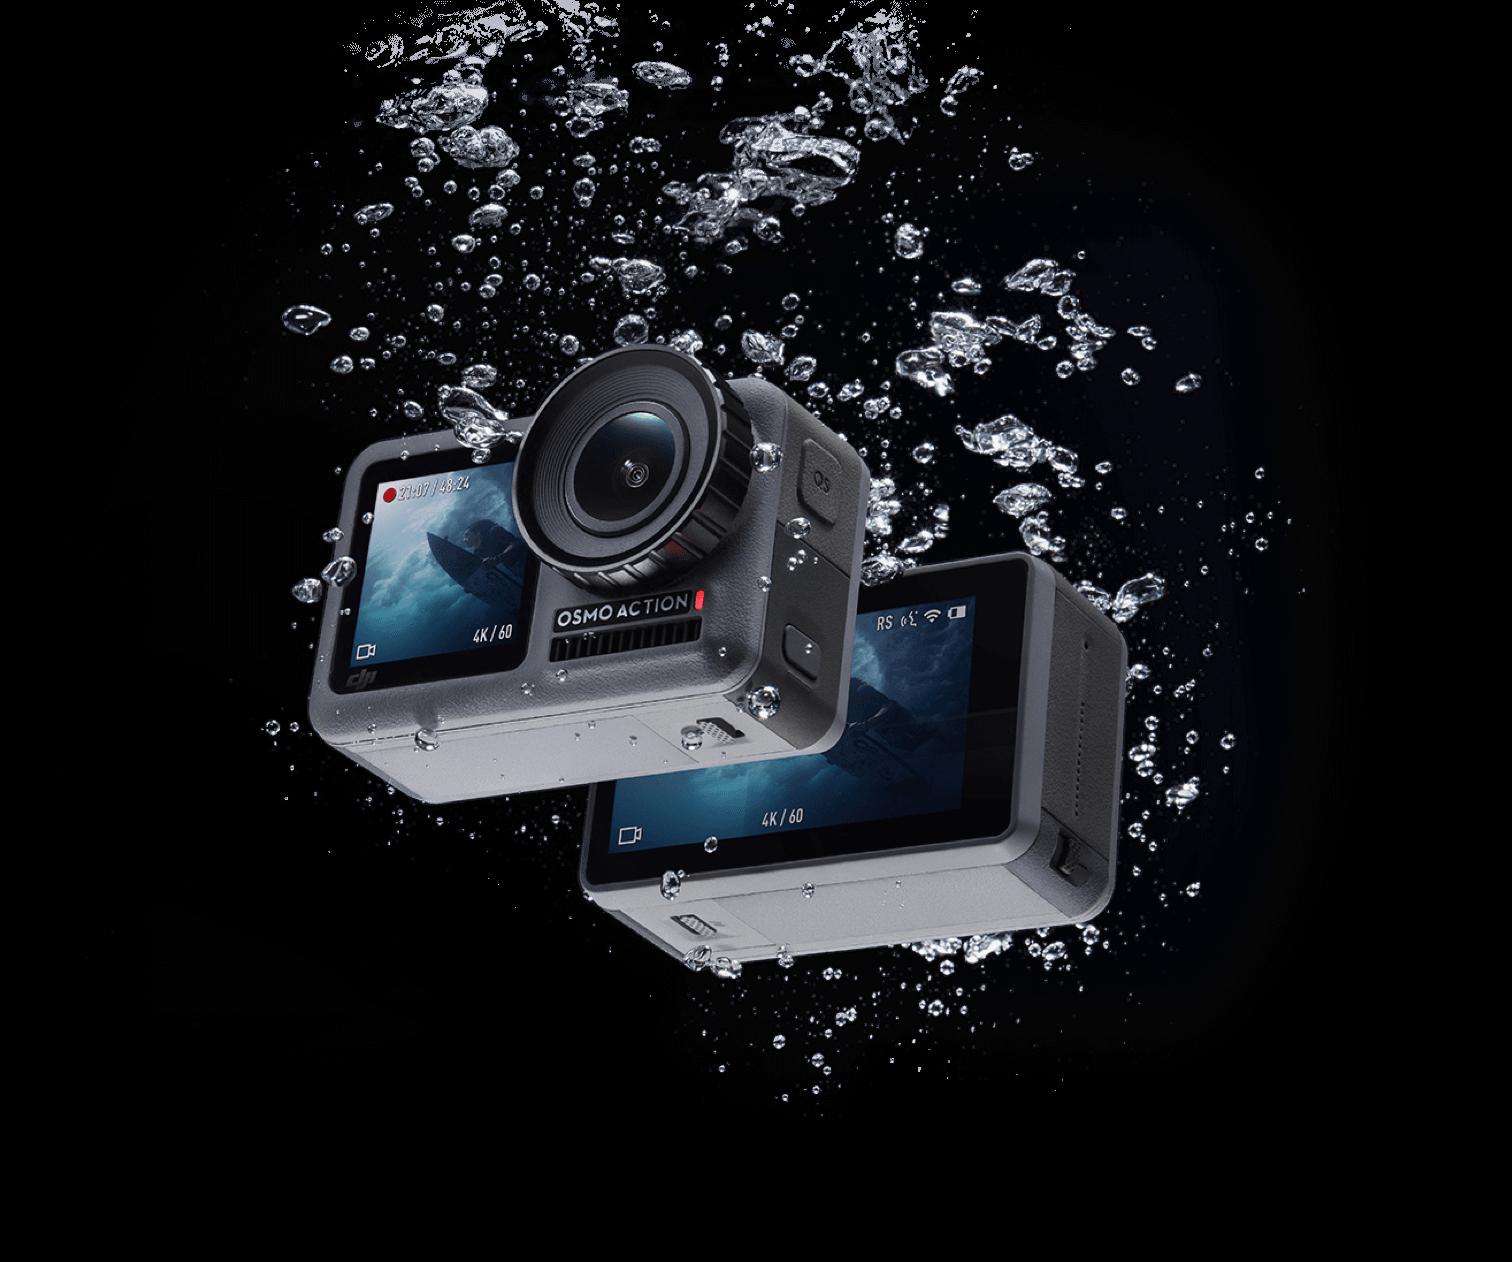 DJI OSMO Action 运动相机以独特前置彩屏瞄准vloger市场,支援裸机11米防水 16